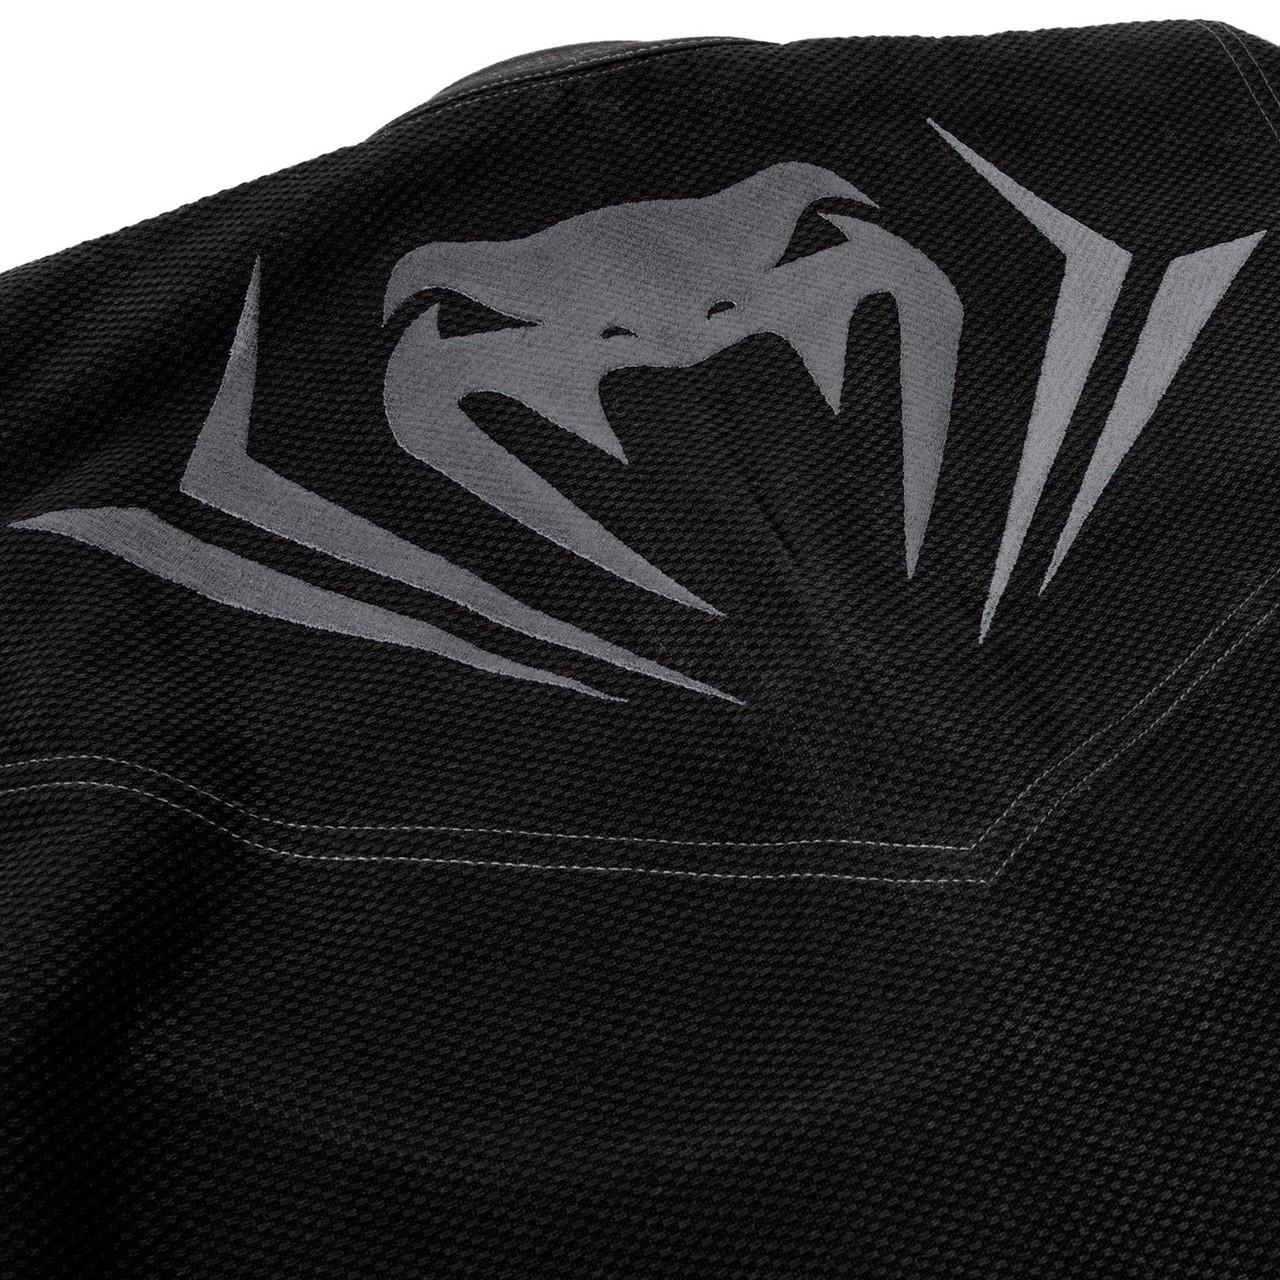 Upper snake logo Venum Elite BJJ GI in Black on black  is now available at www.thejiujitsushop.com  Enjoy Free Shipping from The Jiu Jitsu Shop today!